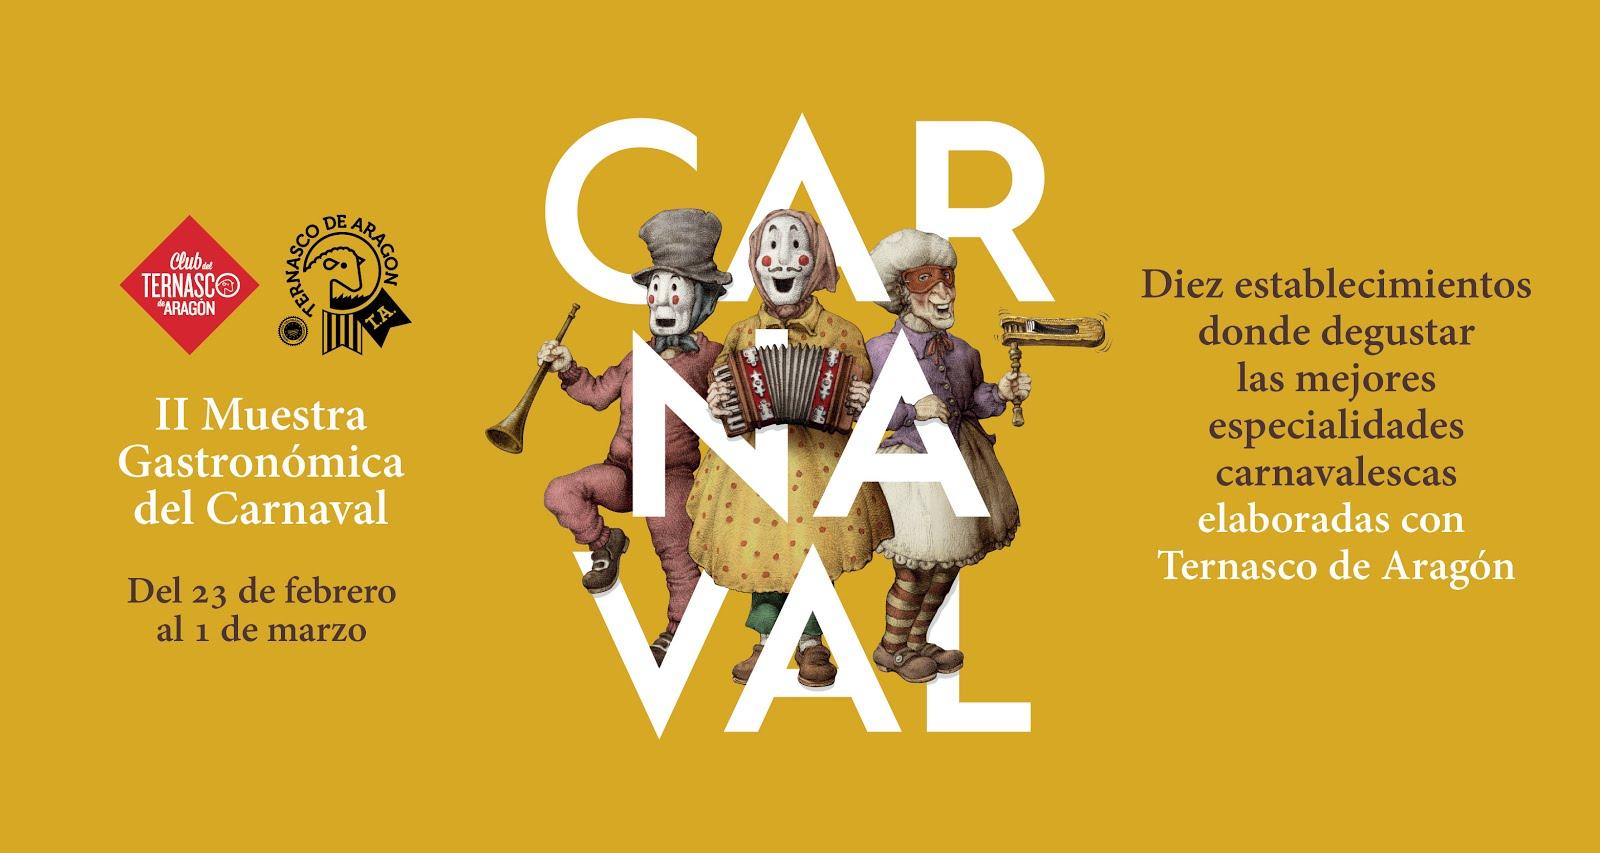 Carnaval con TERNASCO DE ARAGÓN